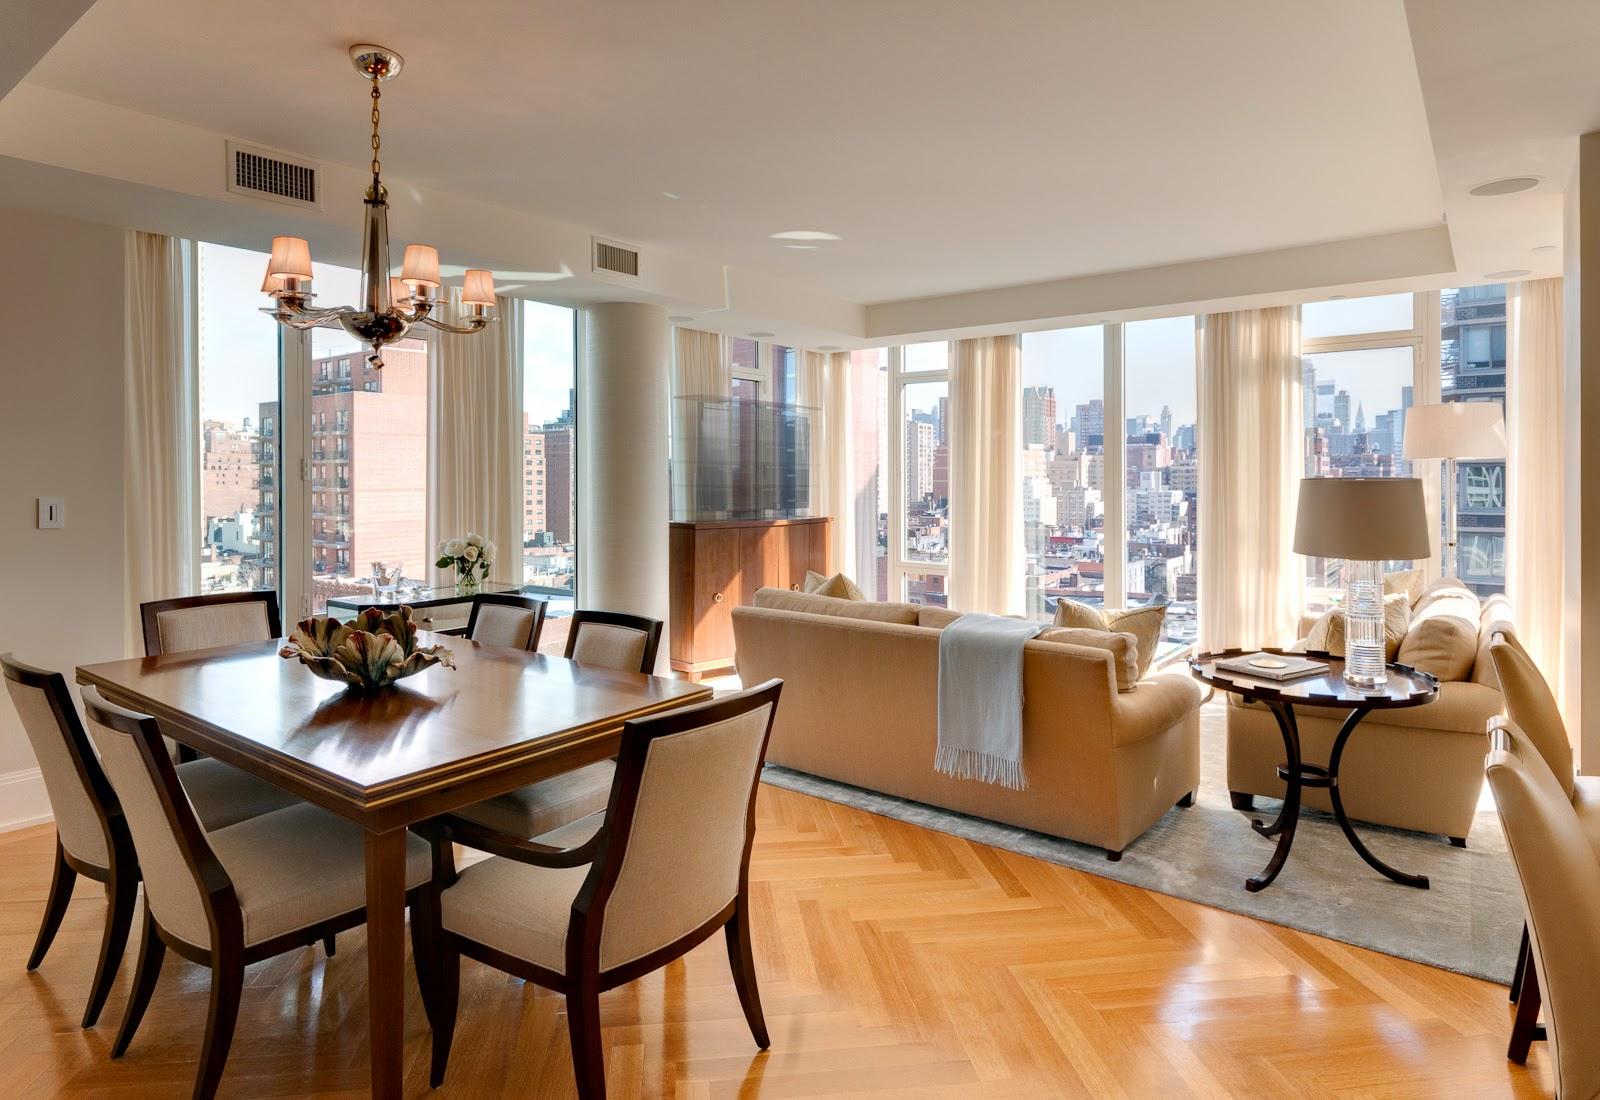 kitchen dining room design ideas photo - 8